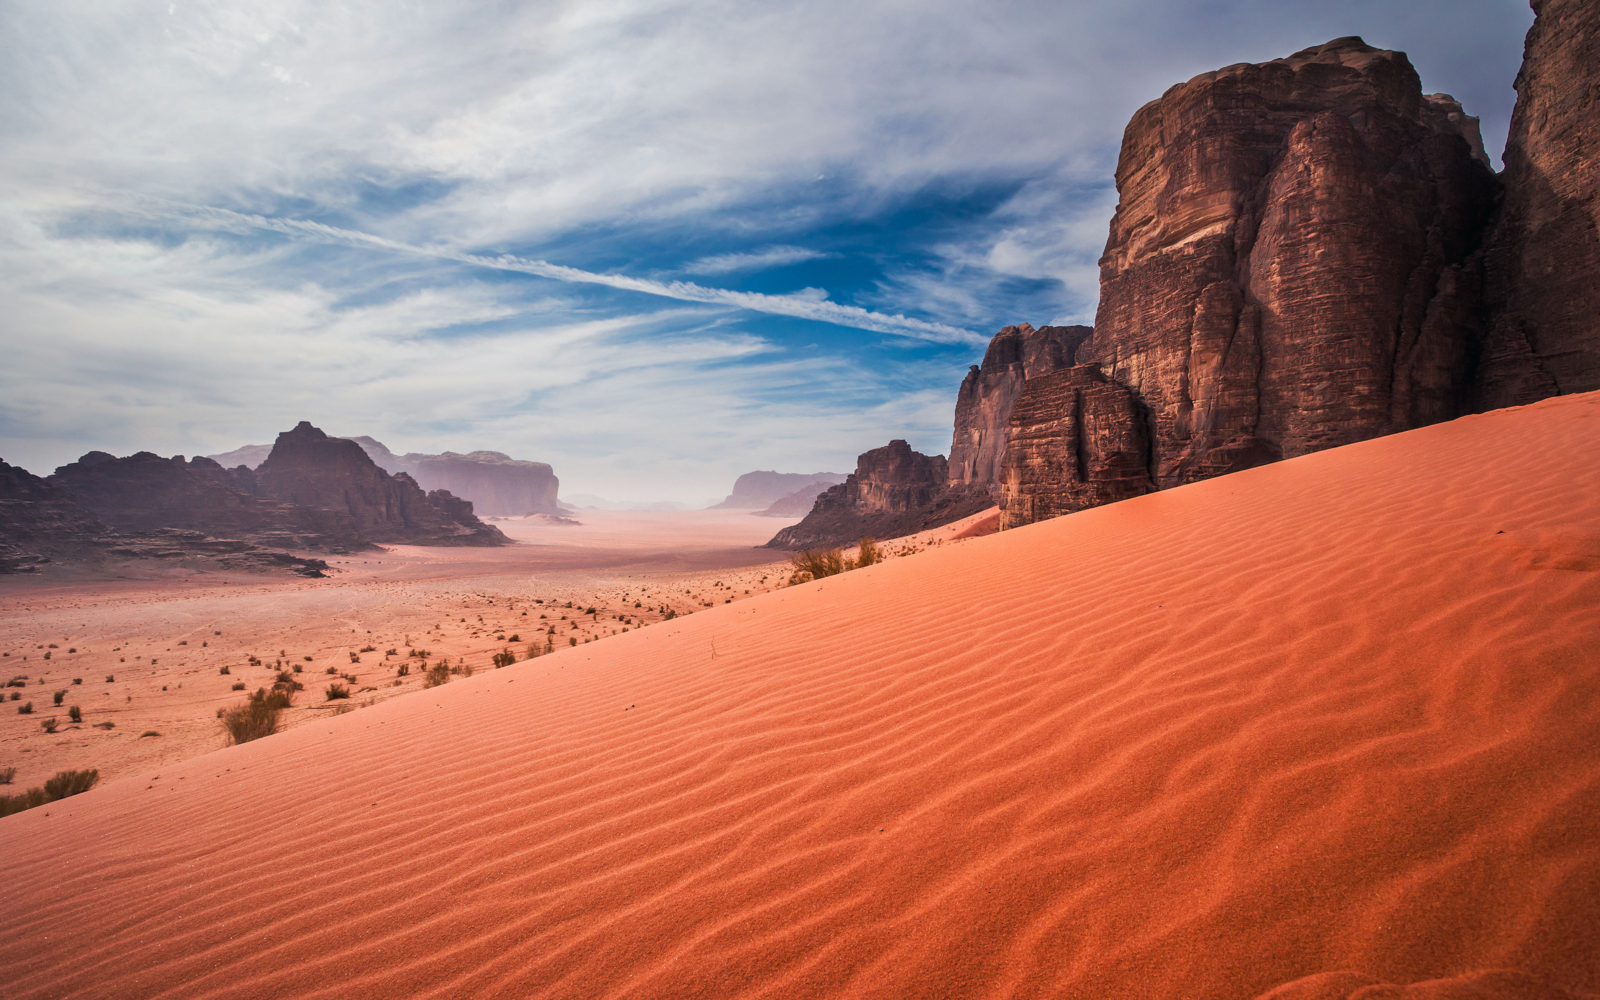 Avventurarsi in Giordania nel deserto del Wadi Rum   Evaneos